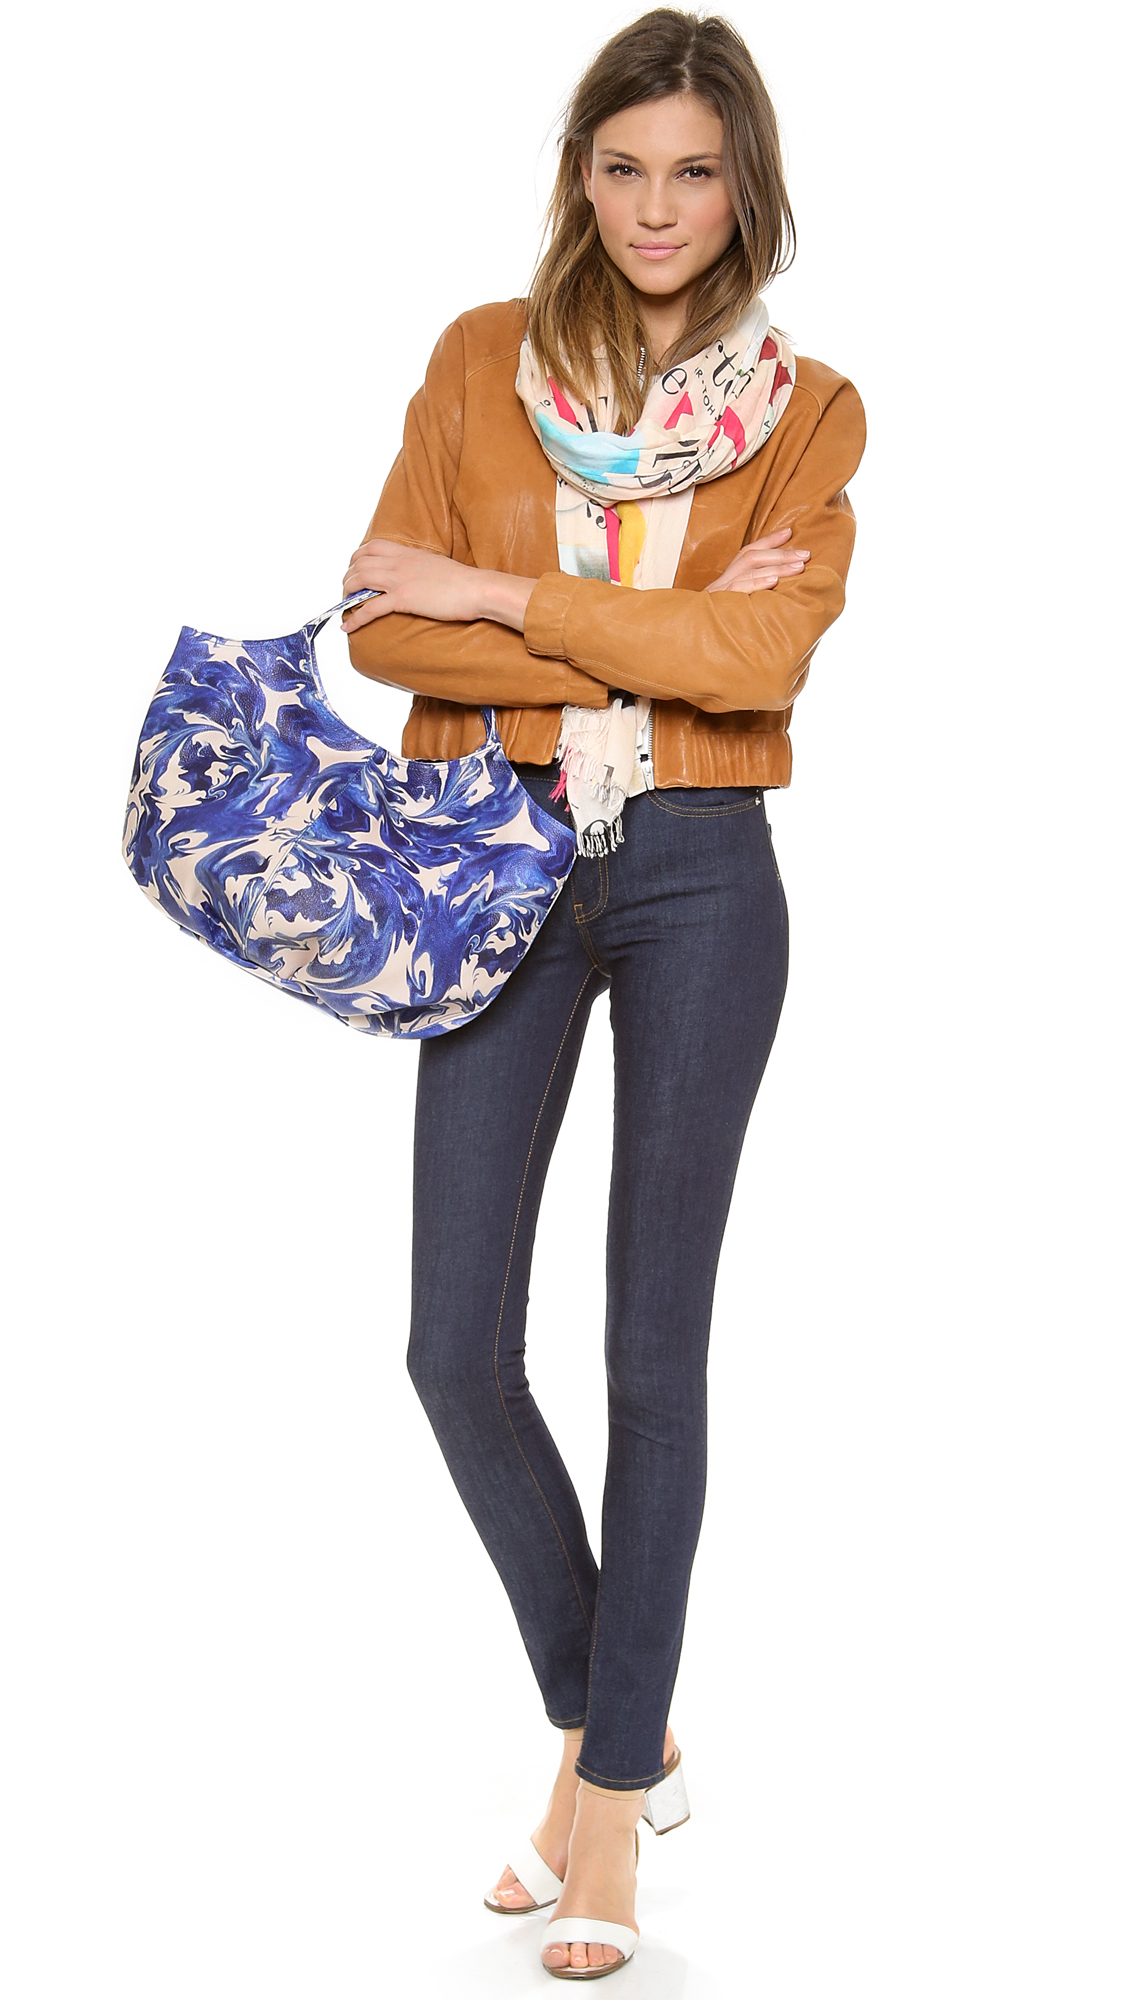 Penelope Chilvers Bags Penelope Chilvers Tie Dye